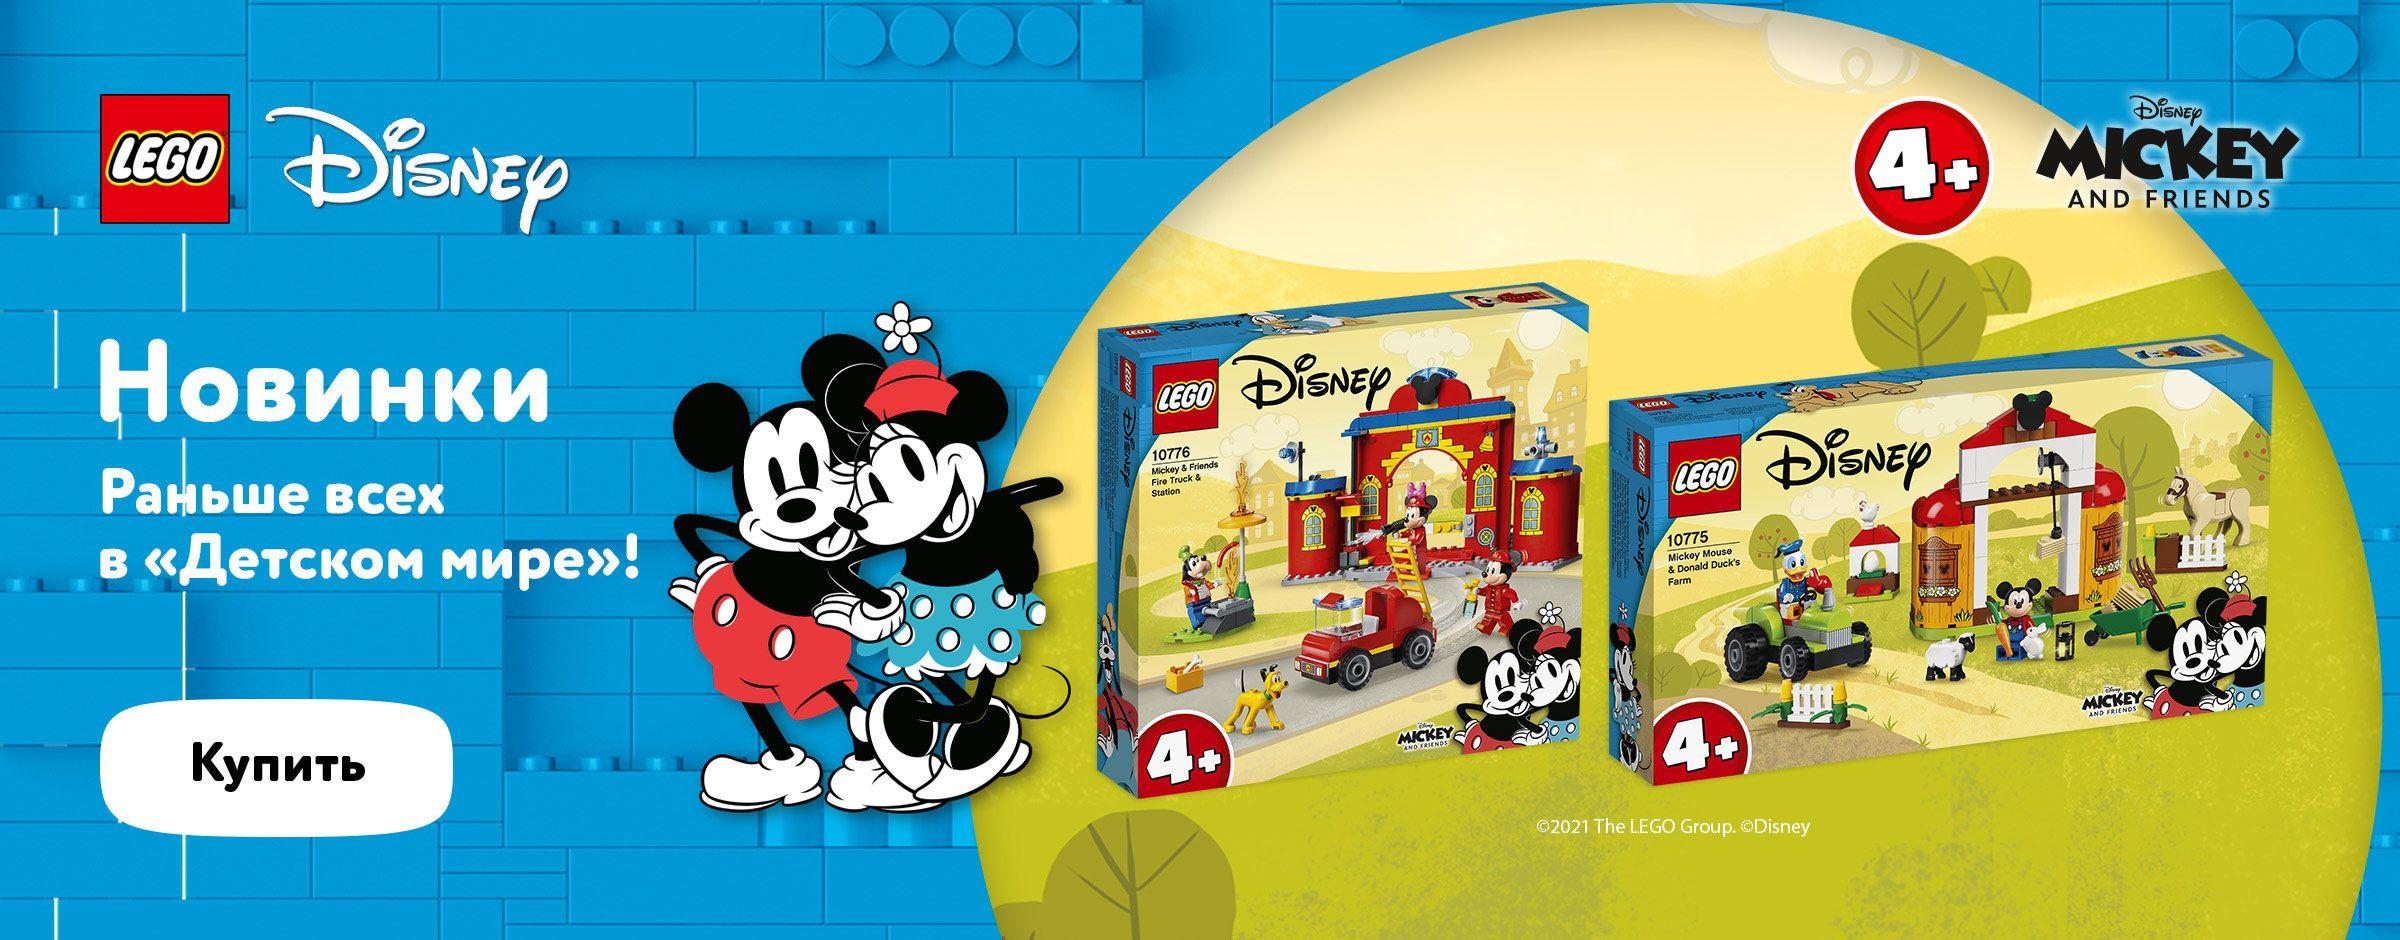 LEGO Disney Микки статика